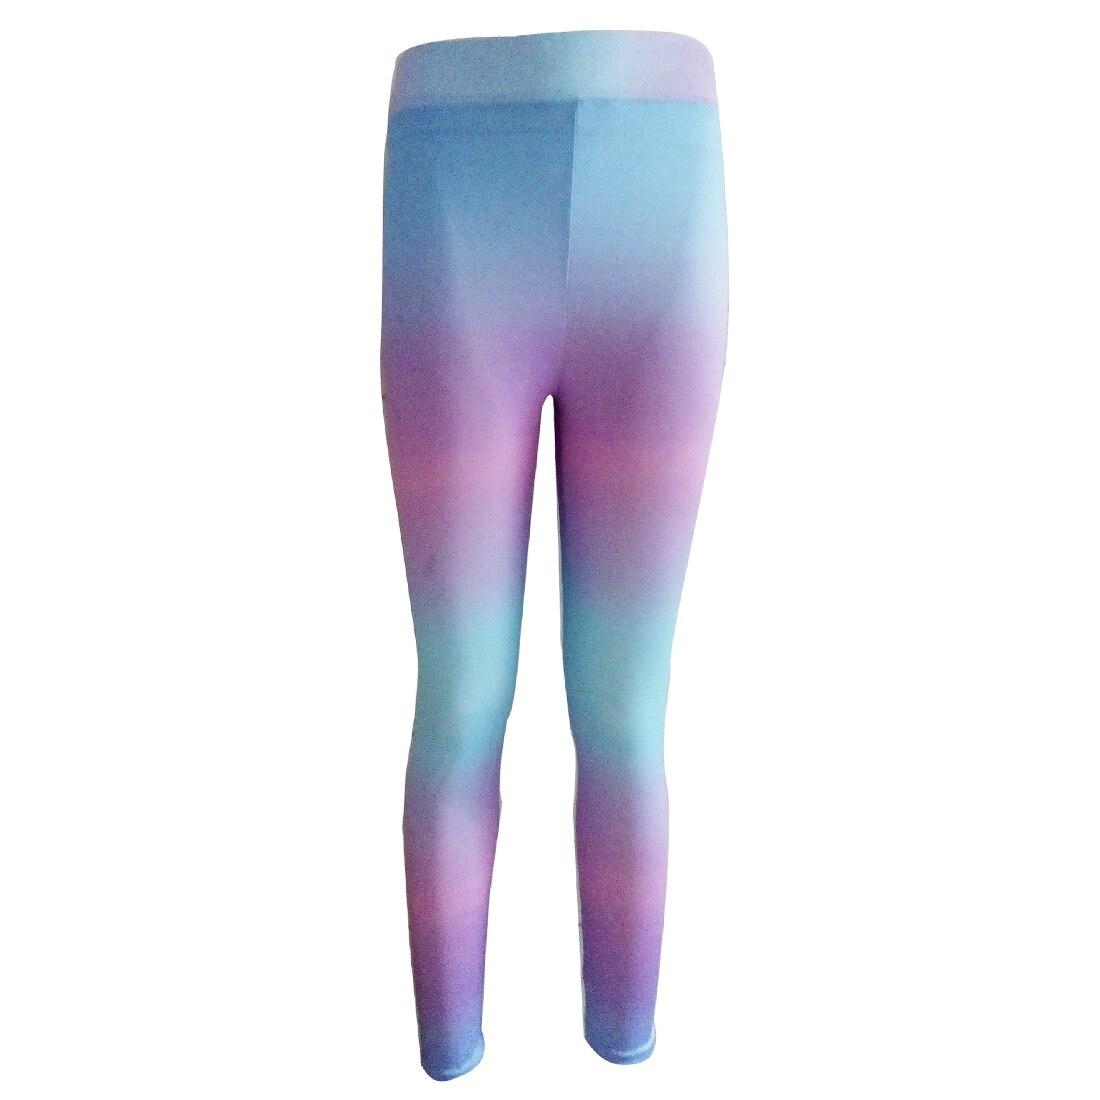 2018 Hot Women High Waist Leggings Neon Rainbow Printed -6732